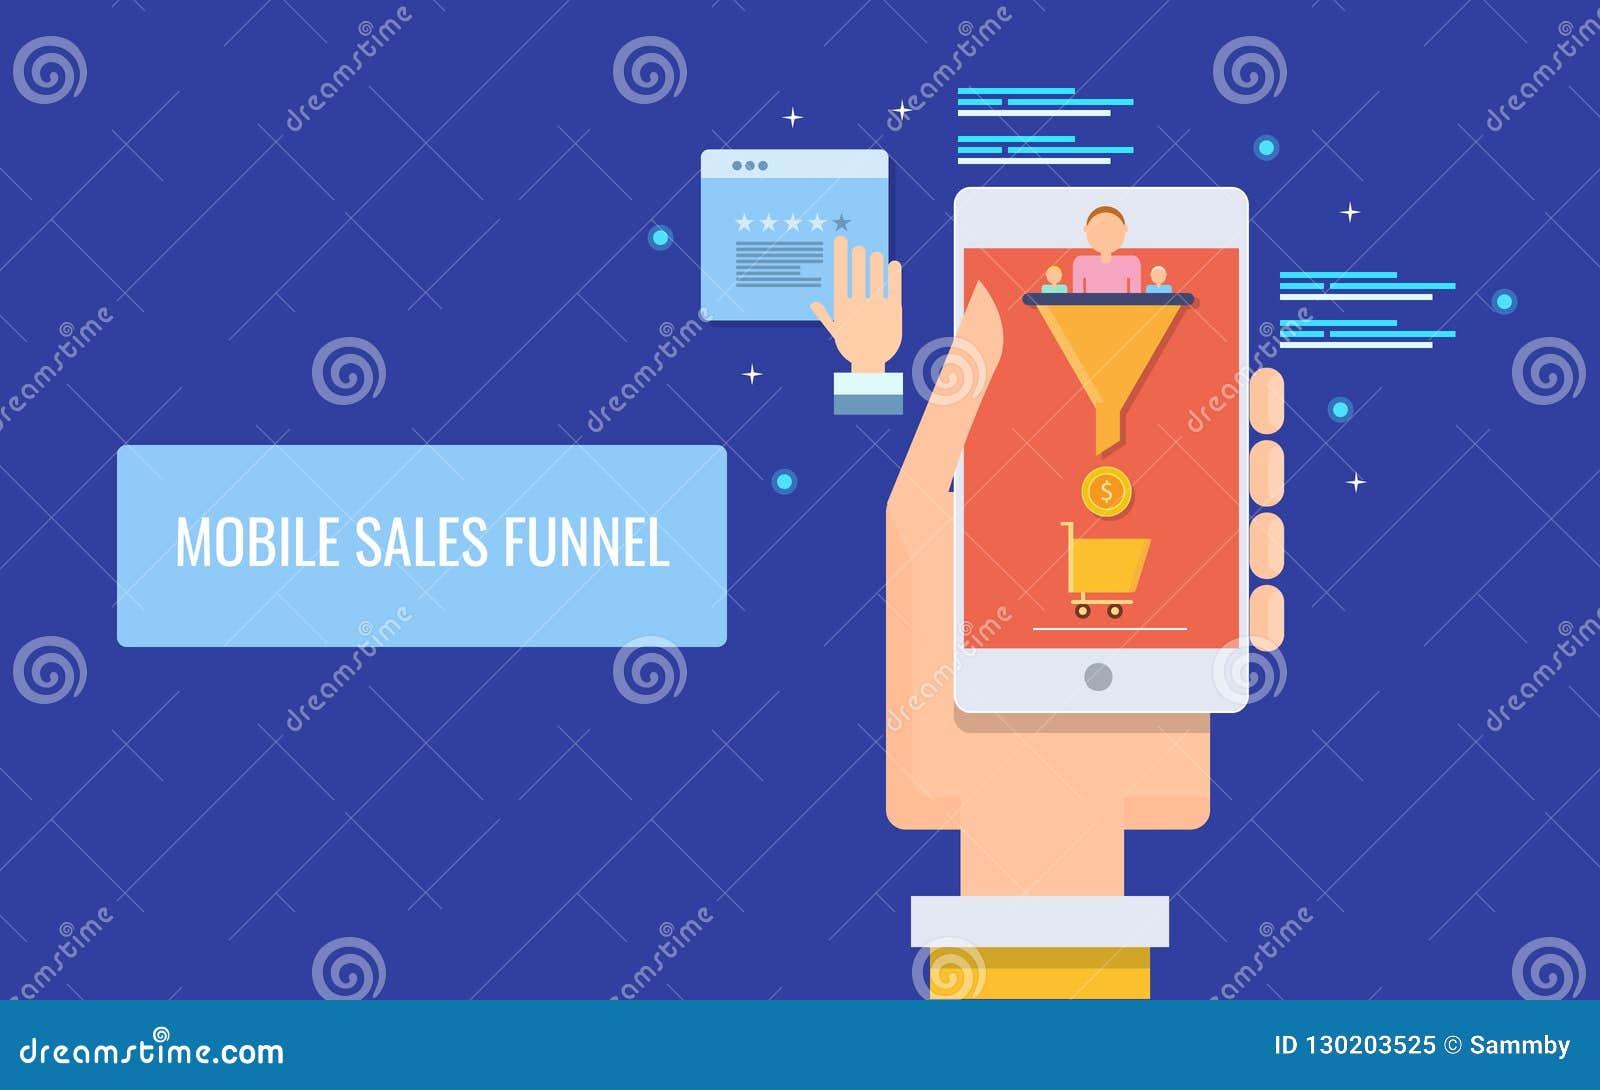 Mobile Sales Funnel, Conversion Optimization, Lead Generation Via